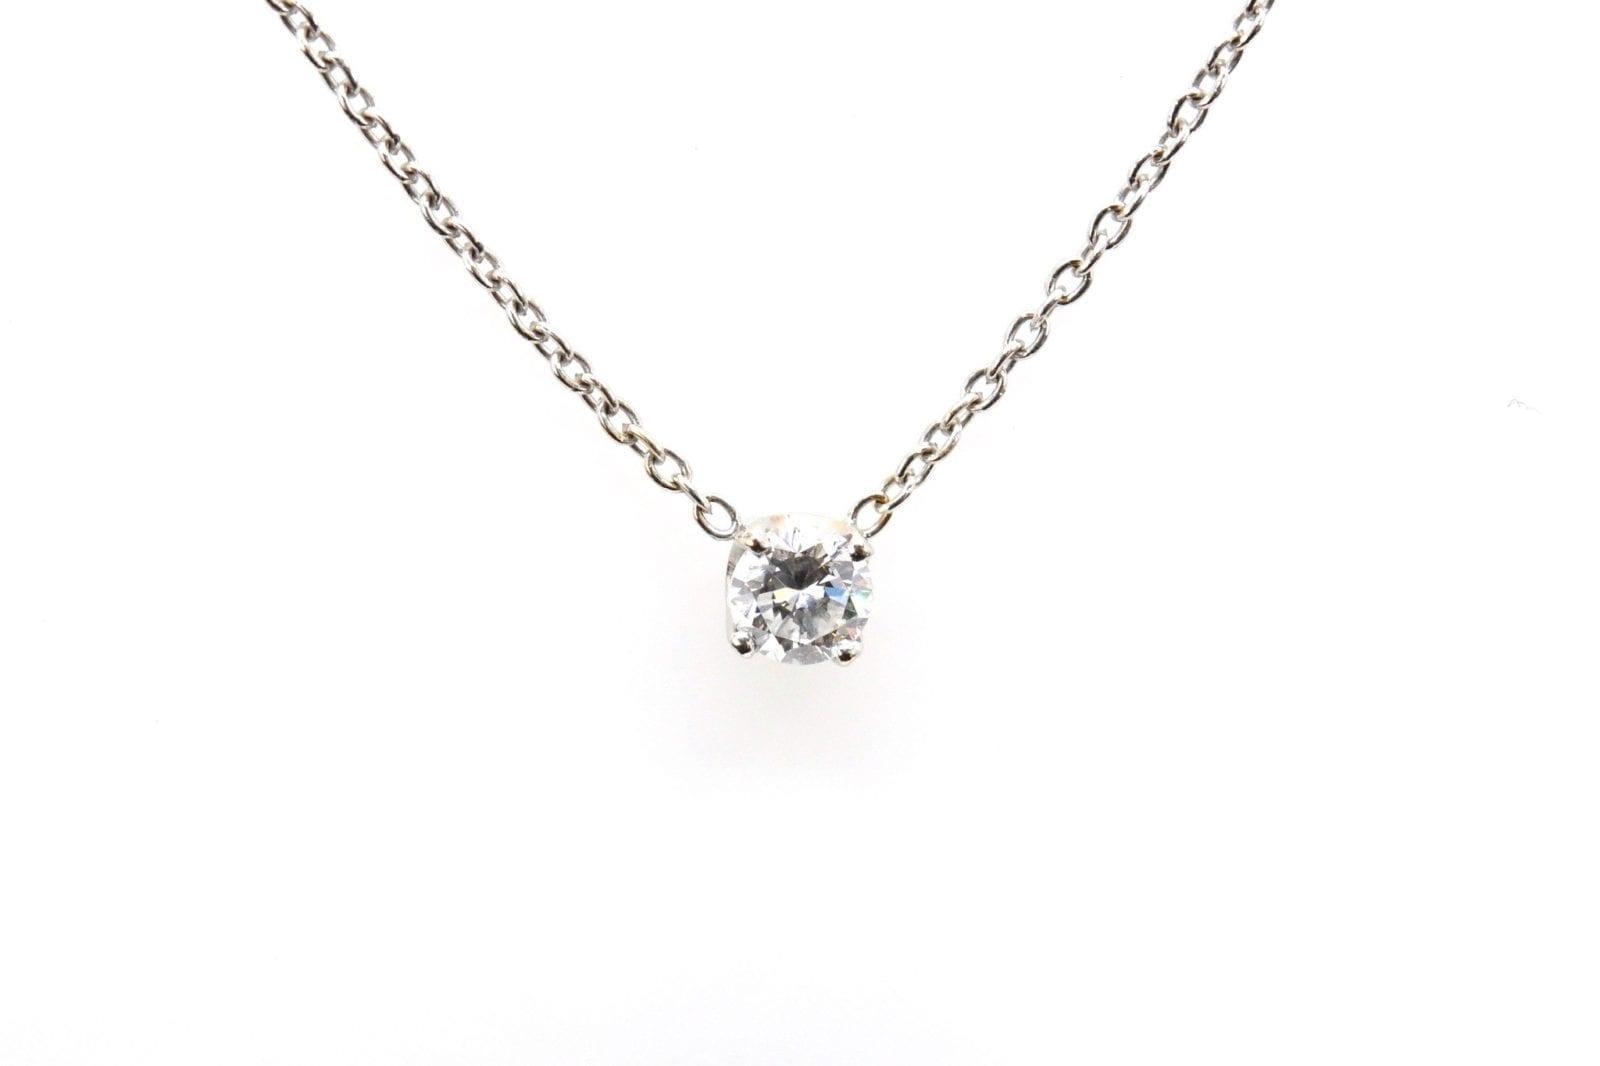 pendentif diamant en or blanc 18k